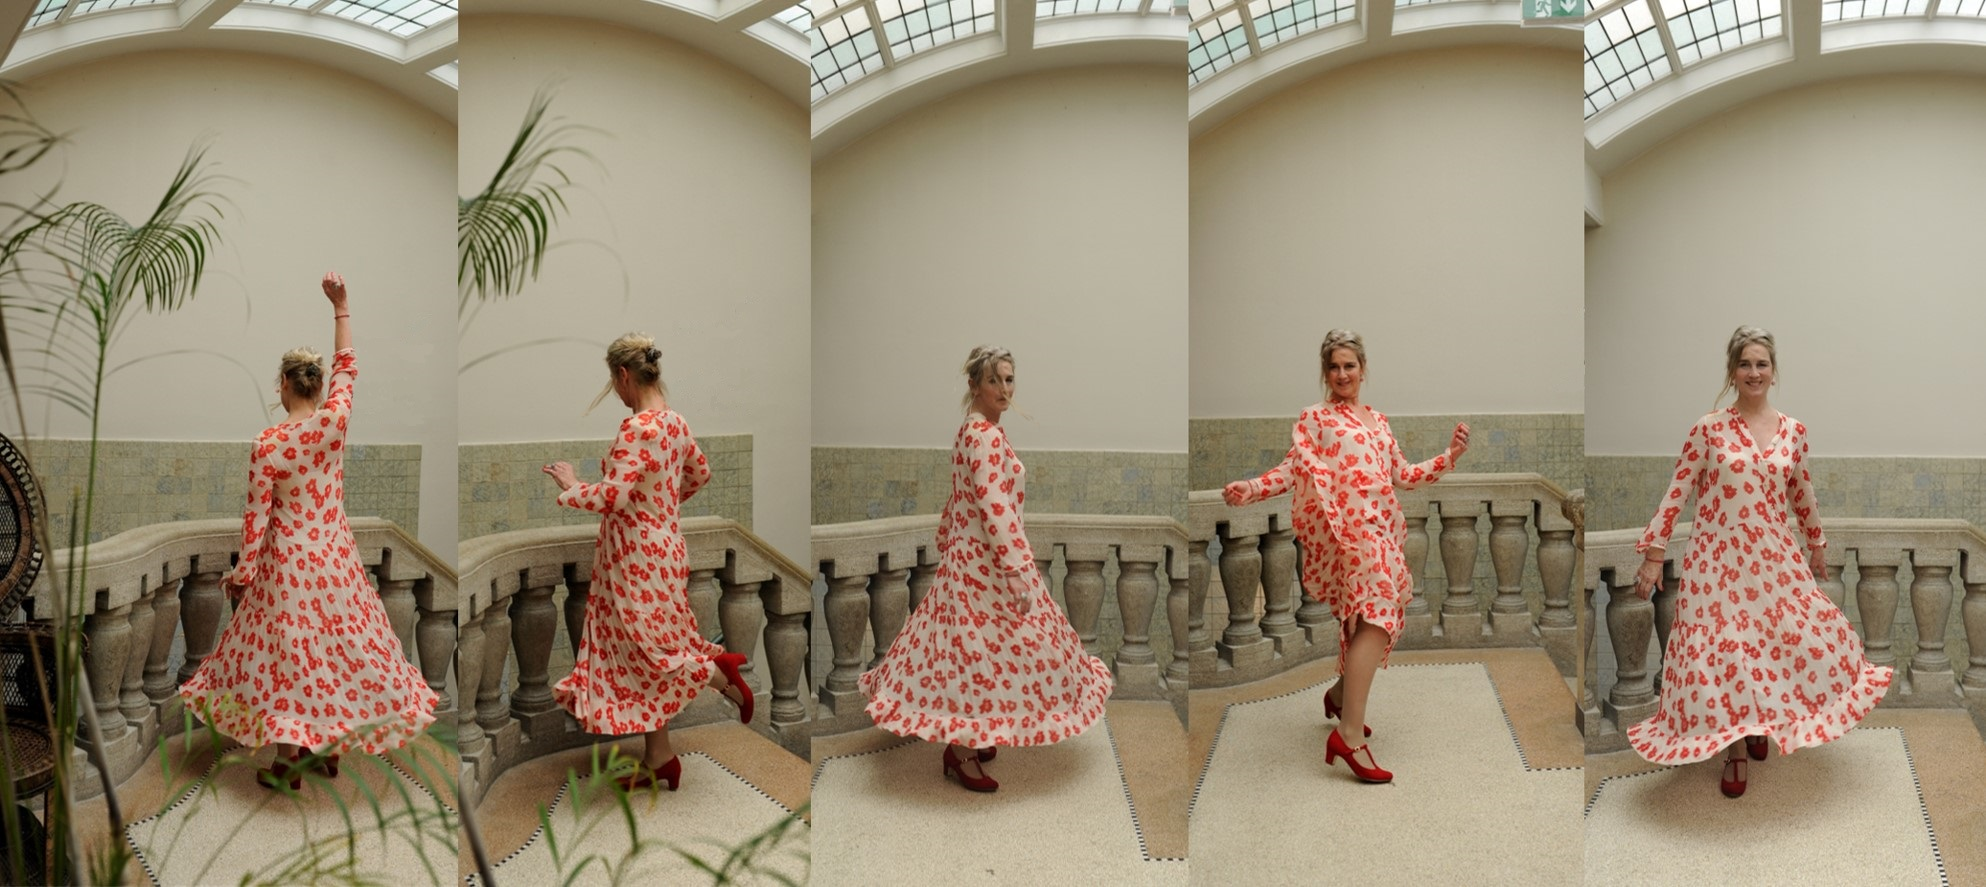 Rebecca Baars kleur- en kledingadvies, eleganter bewegen